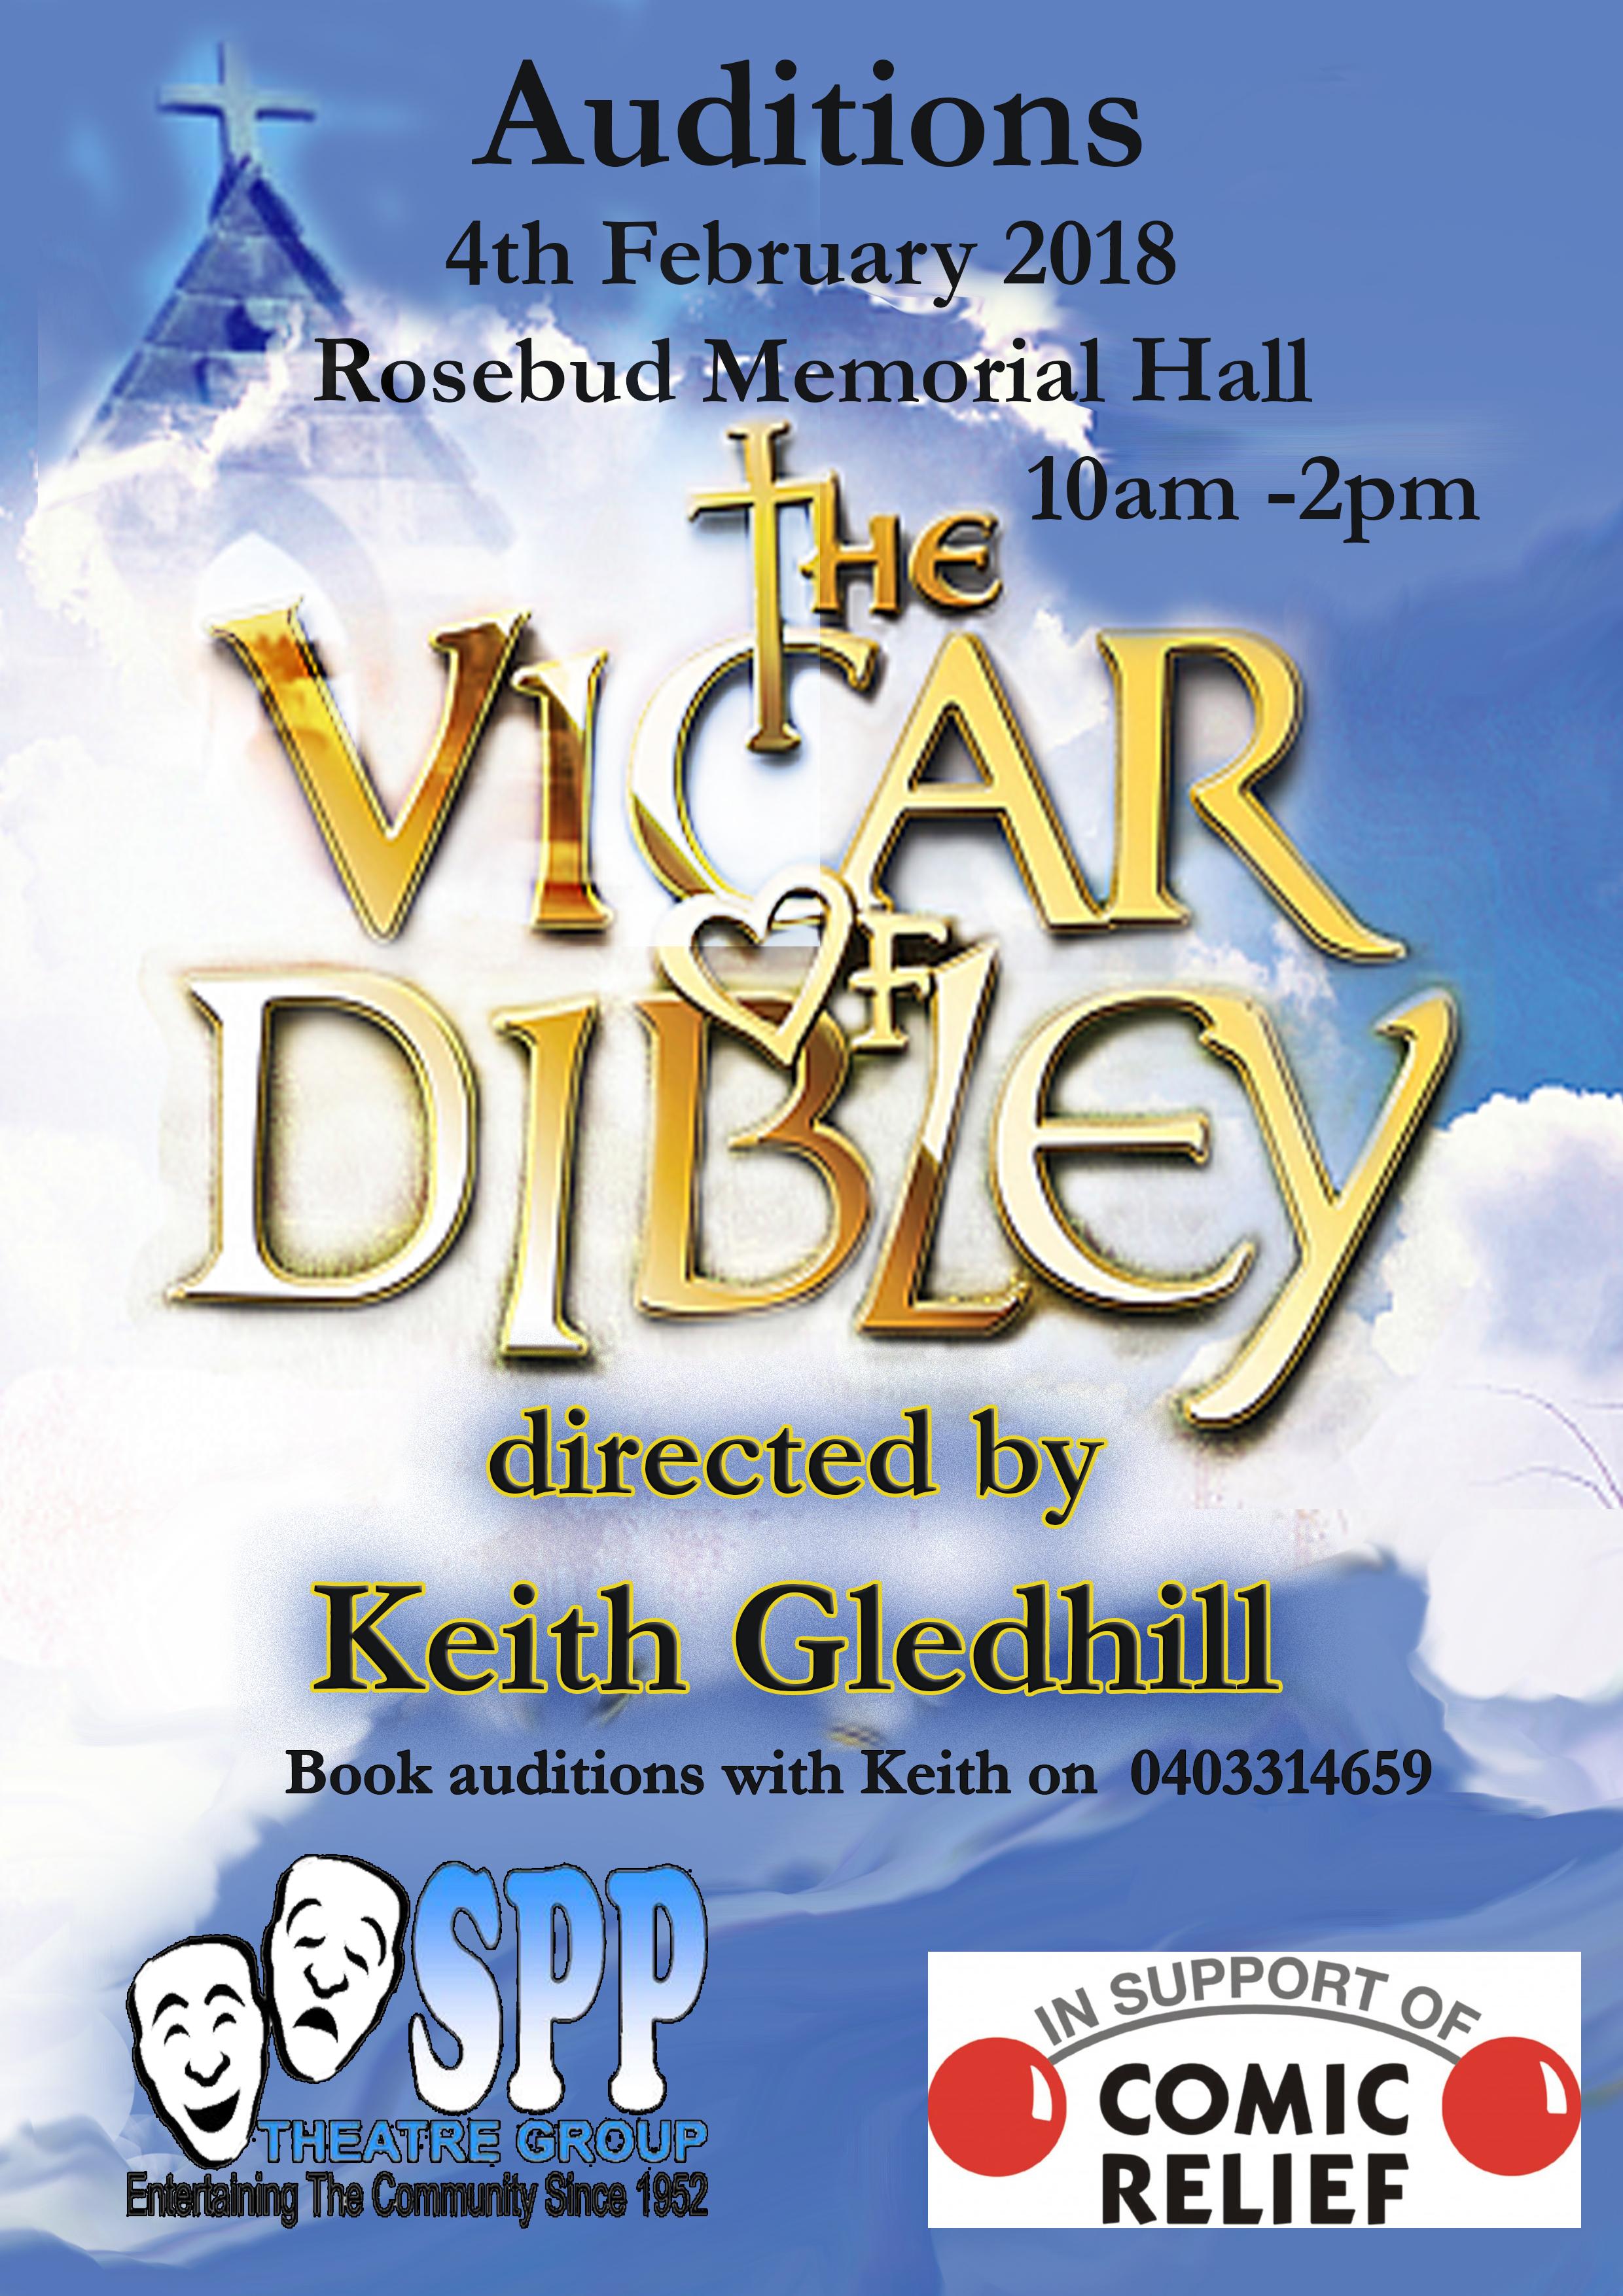 A4 Vicar of dibley Audition .jpg